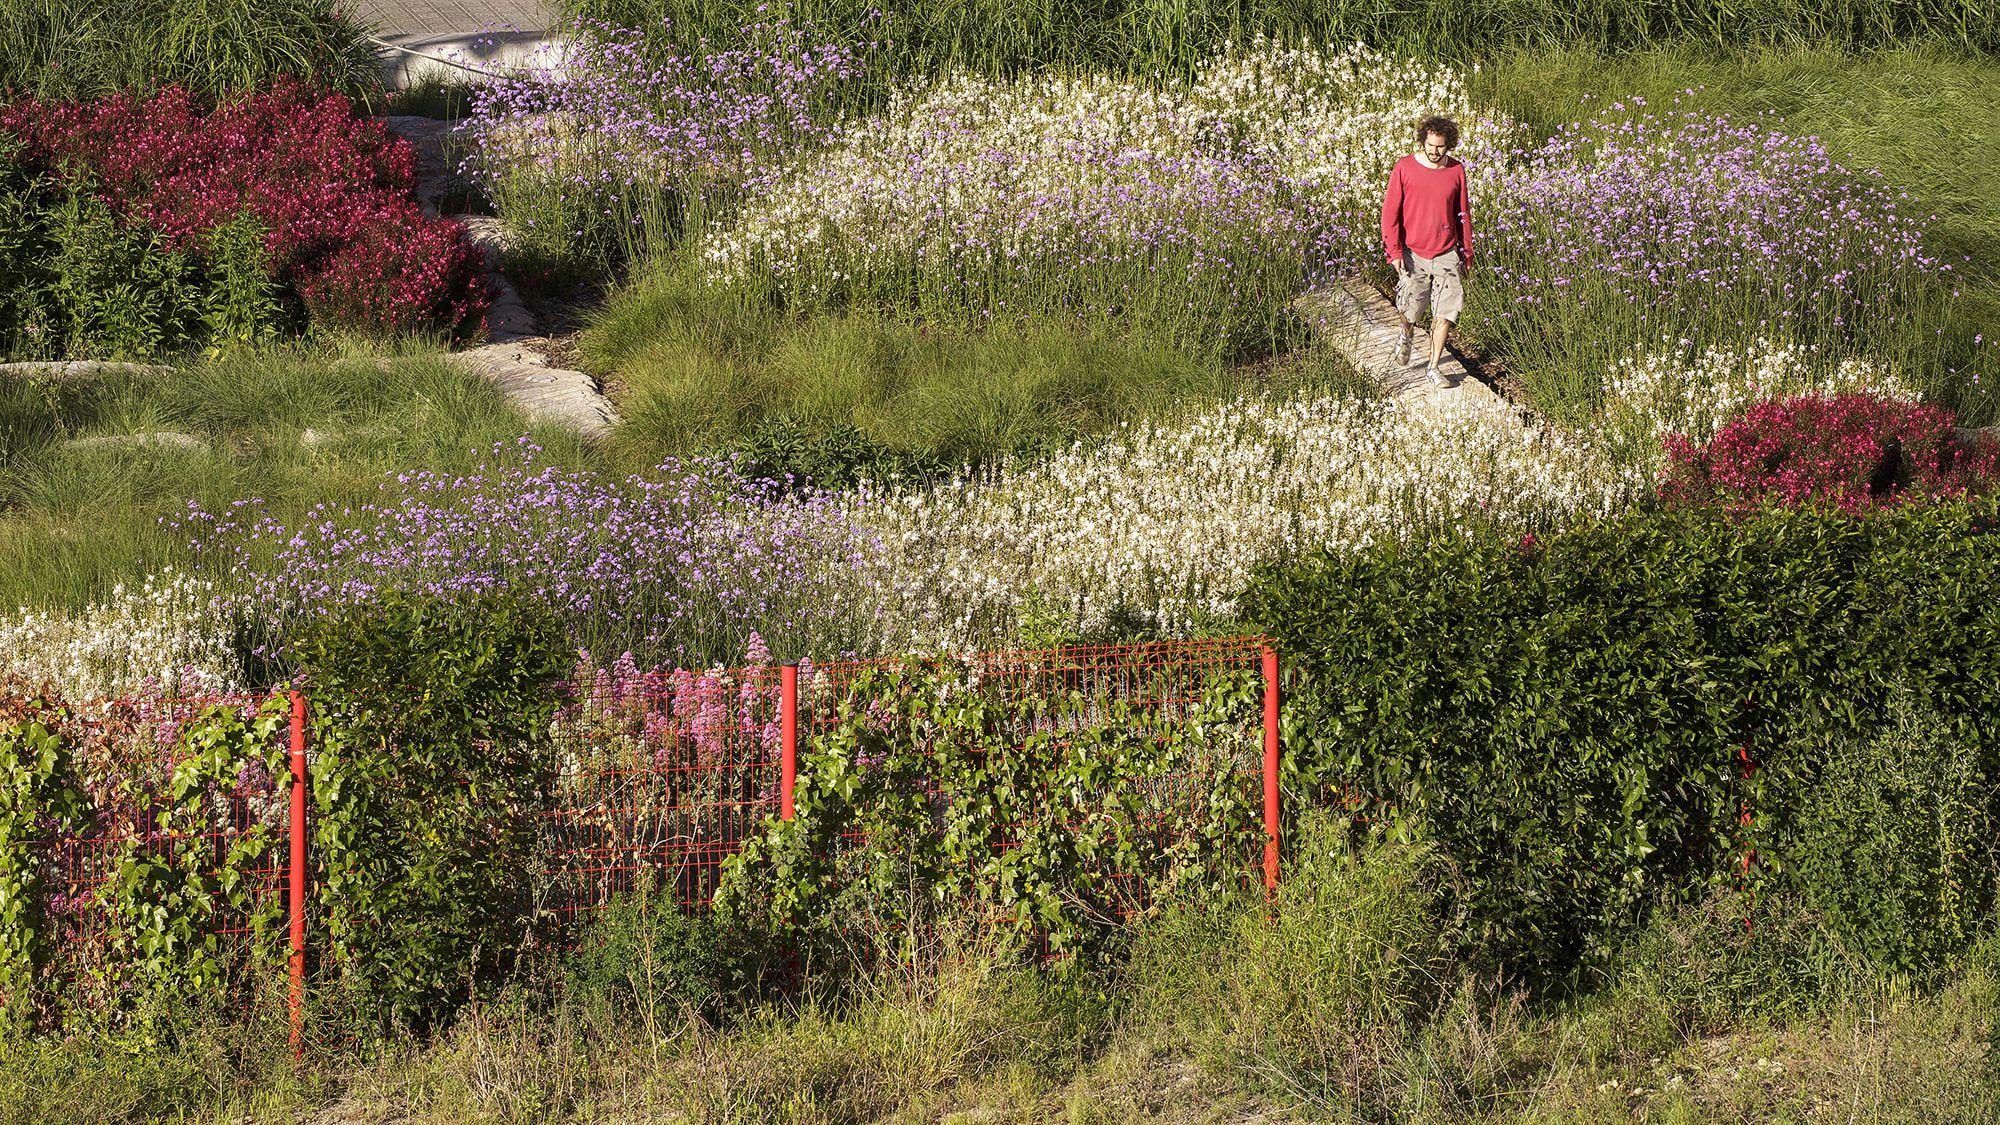 Gael Atelier lea atelier | landscape ecology architecture, gael del río · ninot